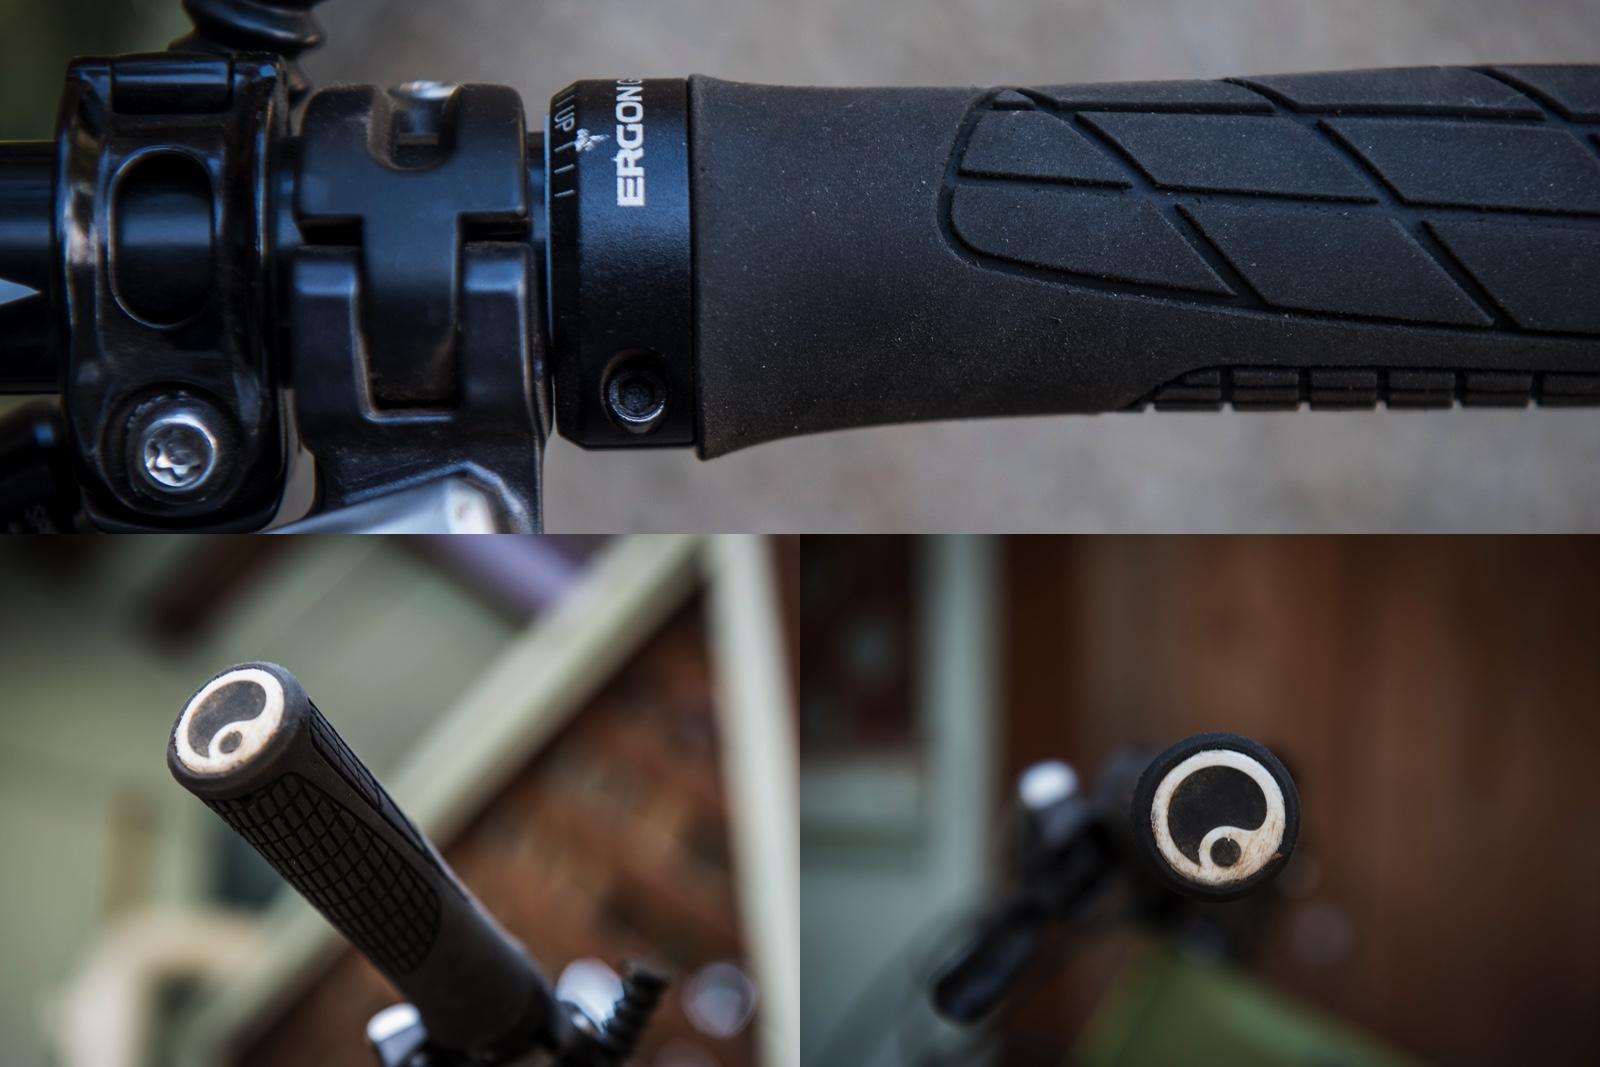 Ergon GA2 Mountain Bike Grips Black